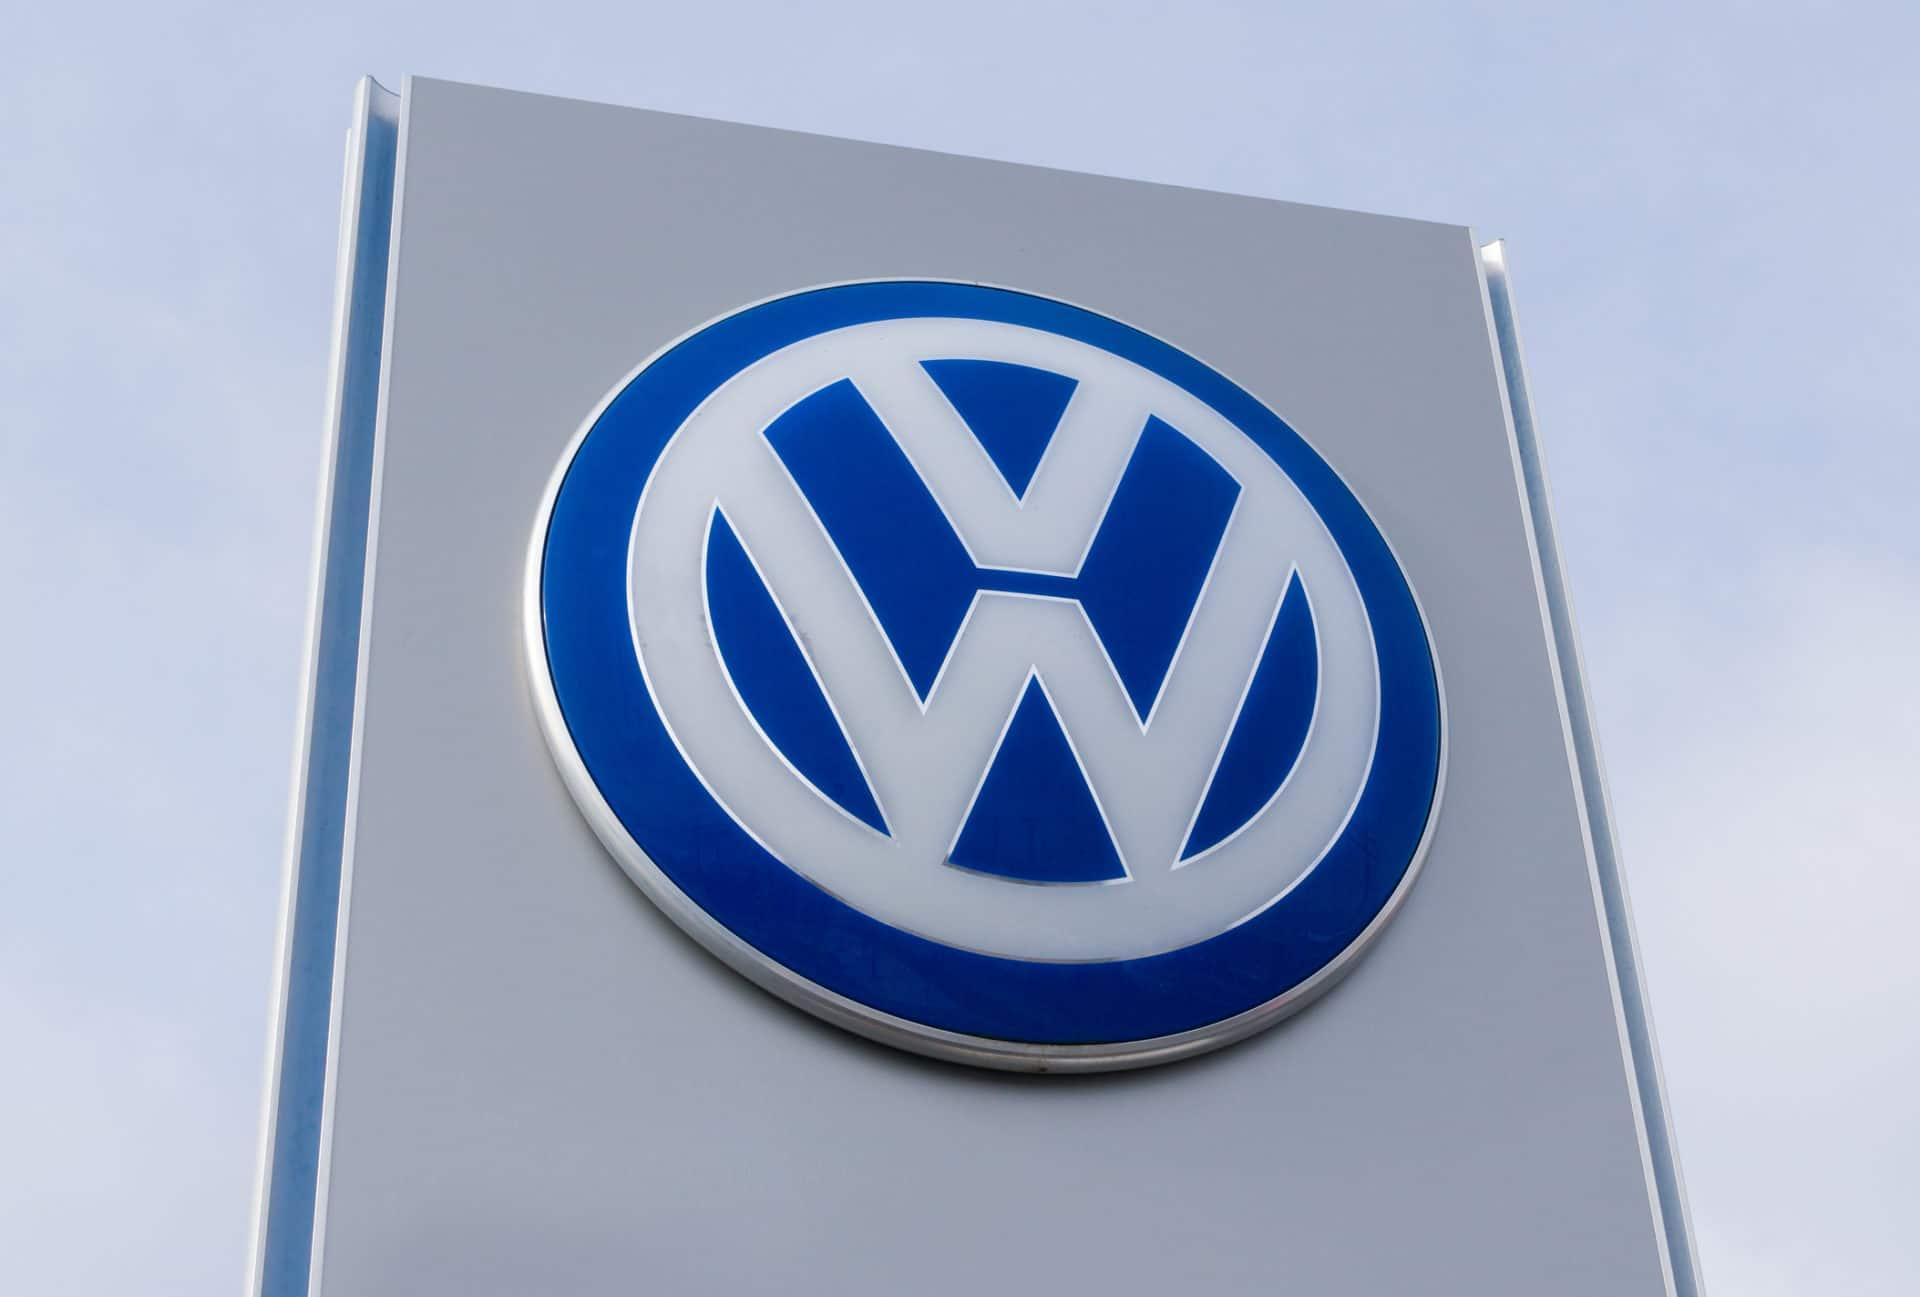 Volkswagen pre-production scandal